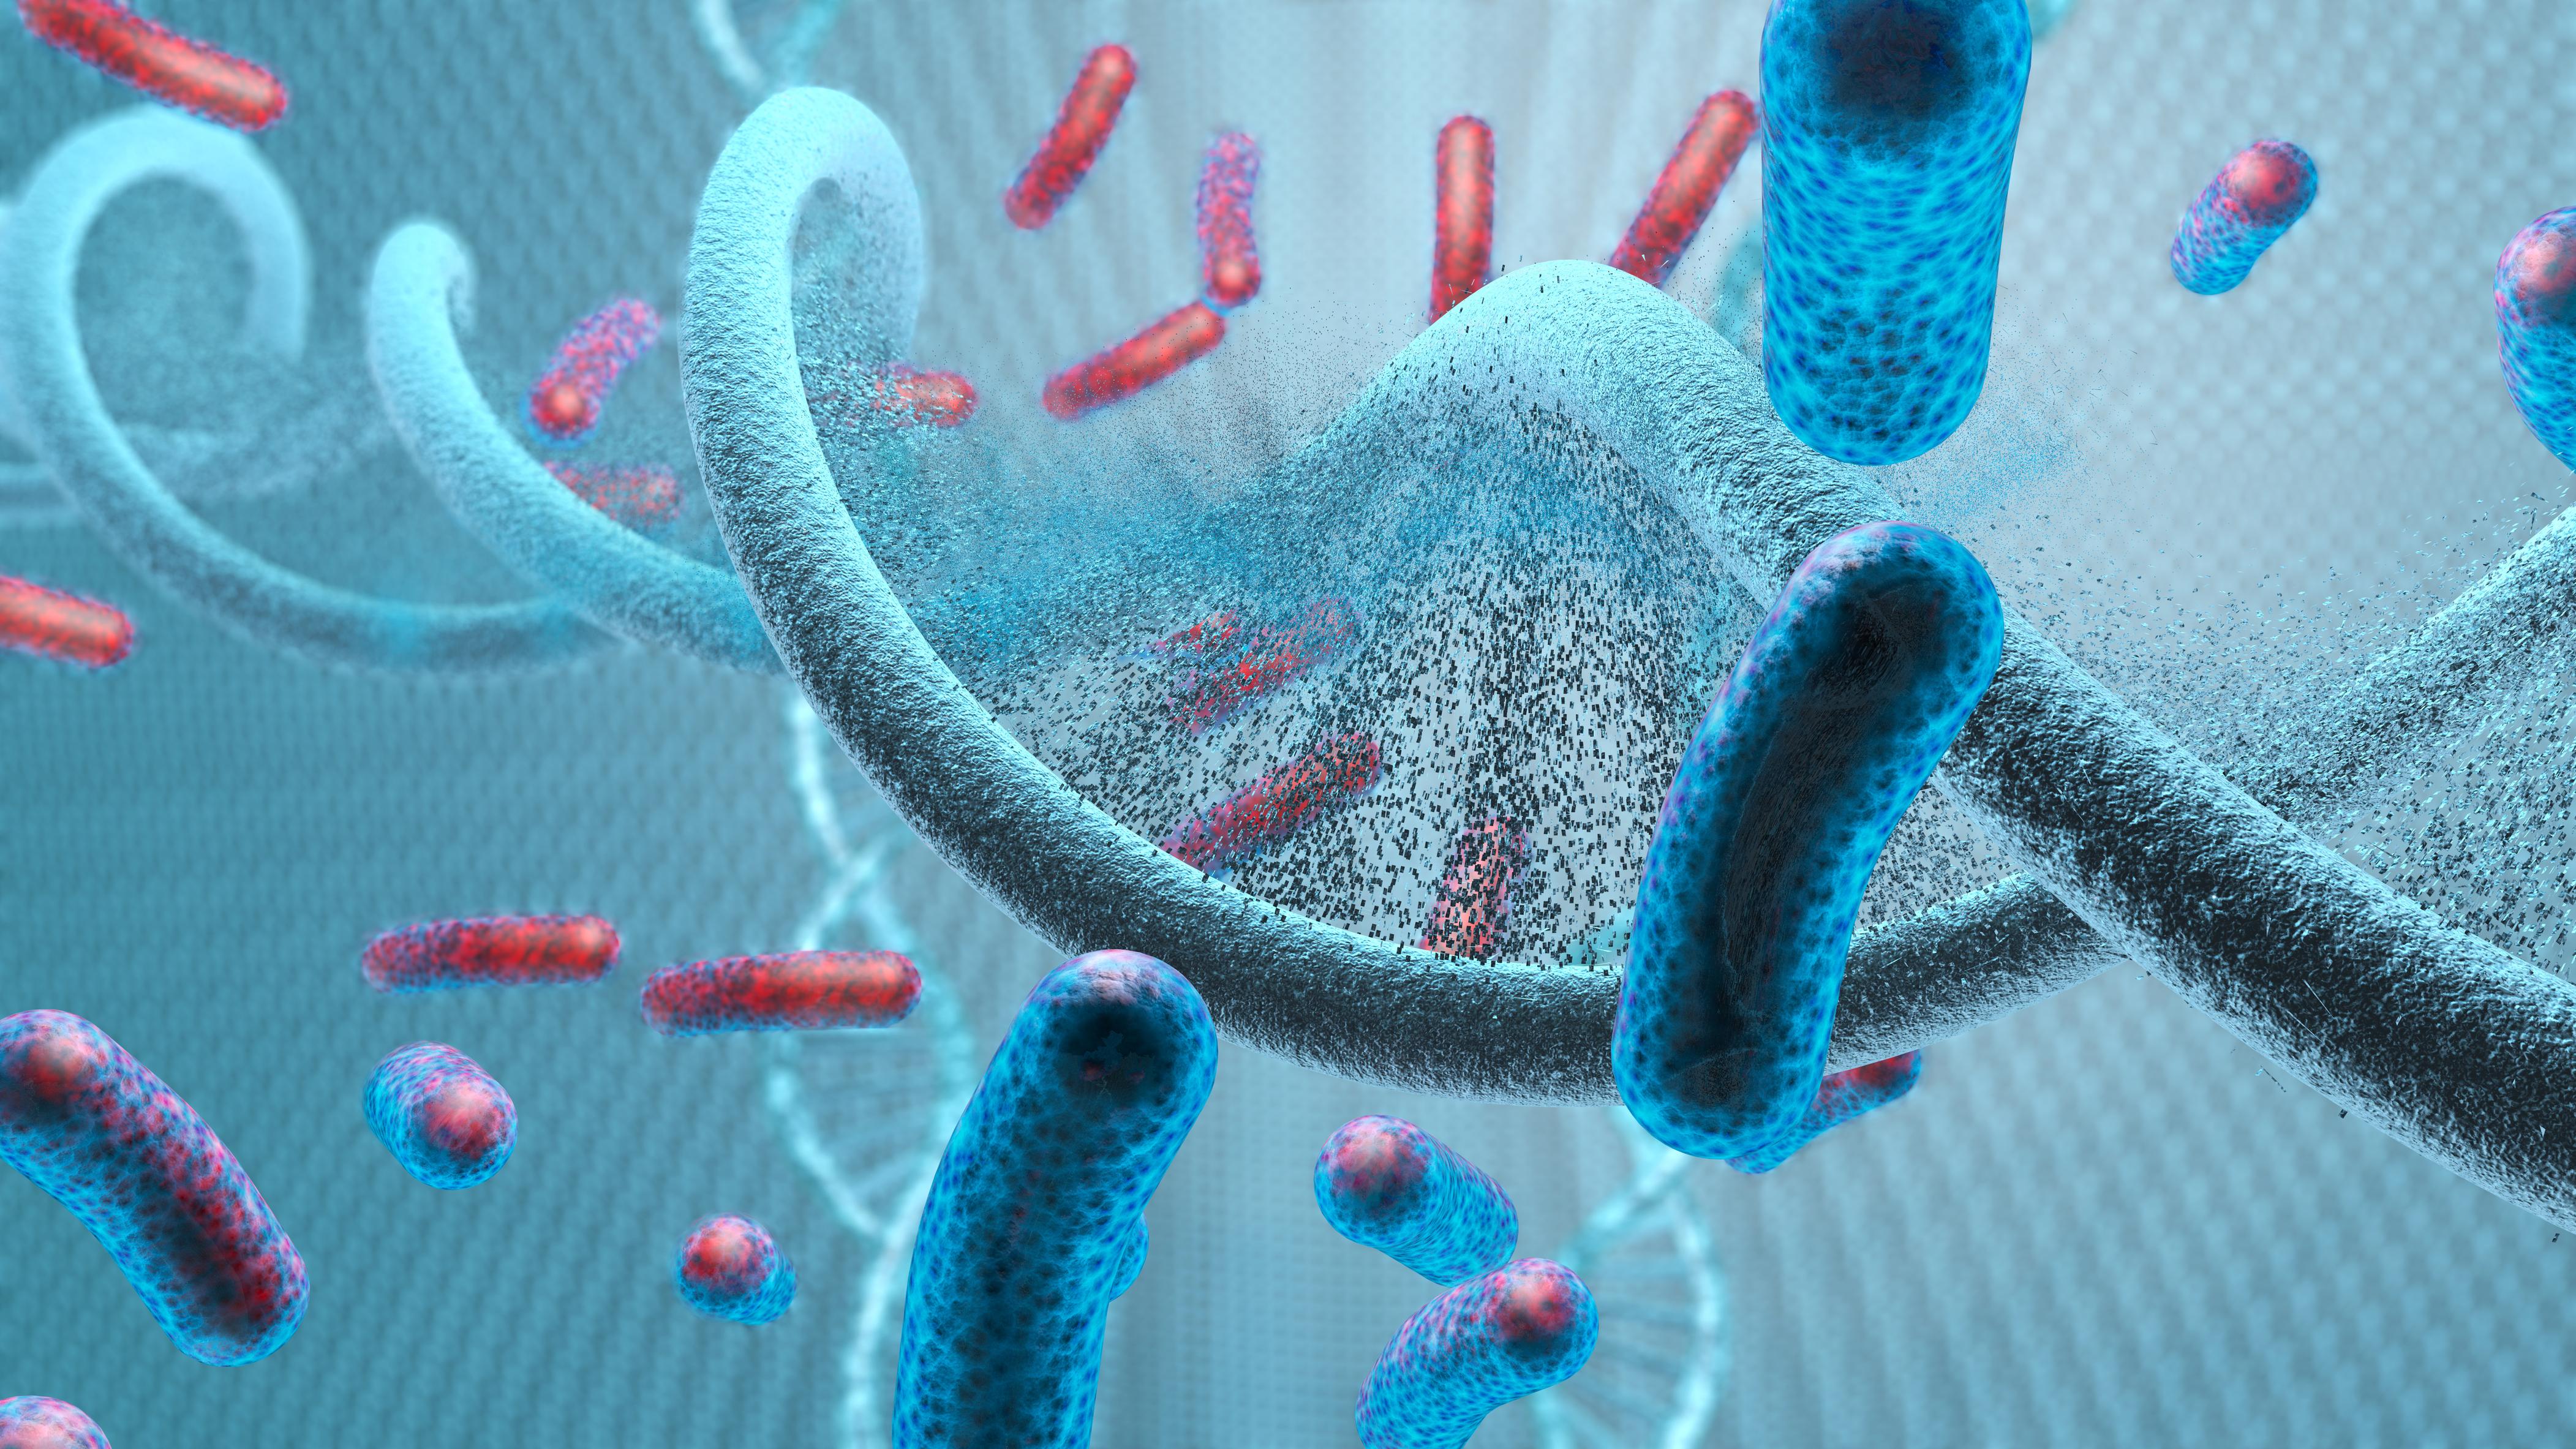 Immune Defenses Enhanced by Master Detox Molecule